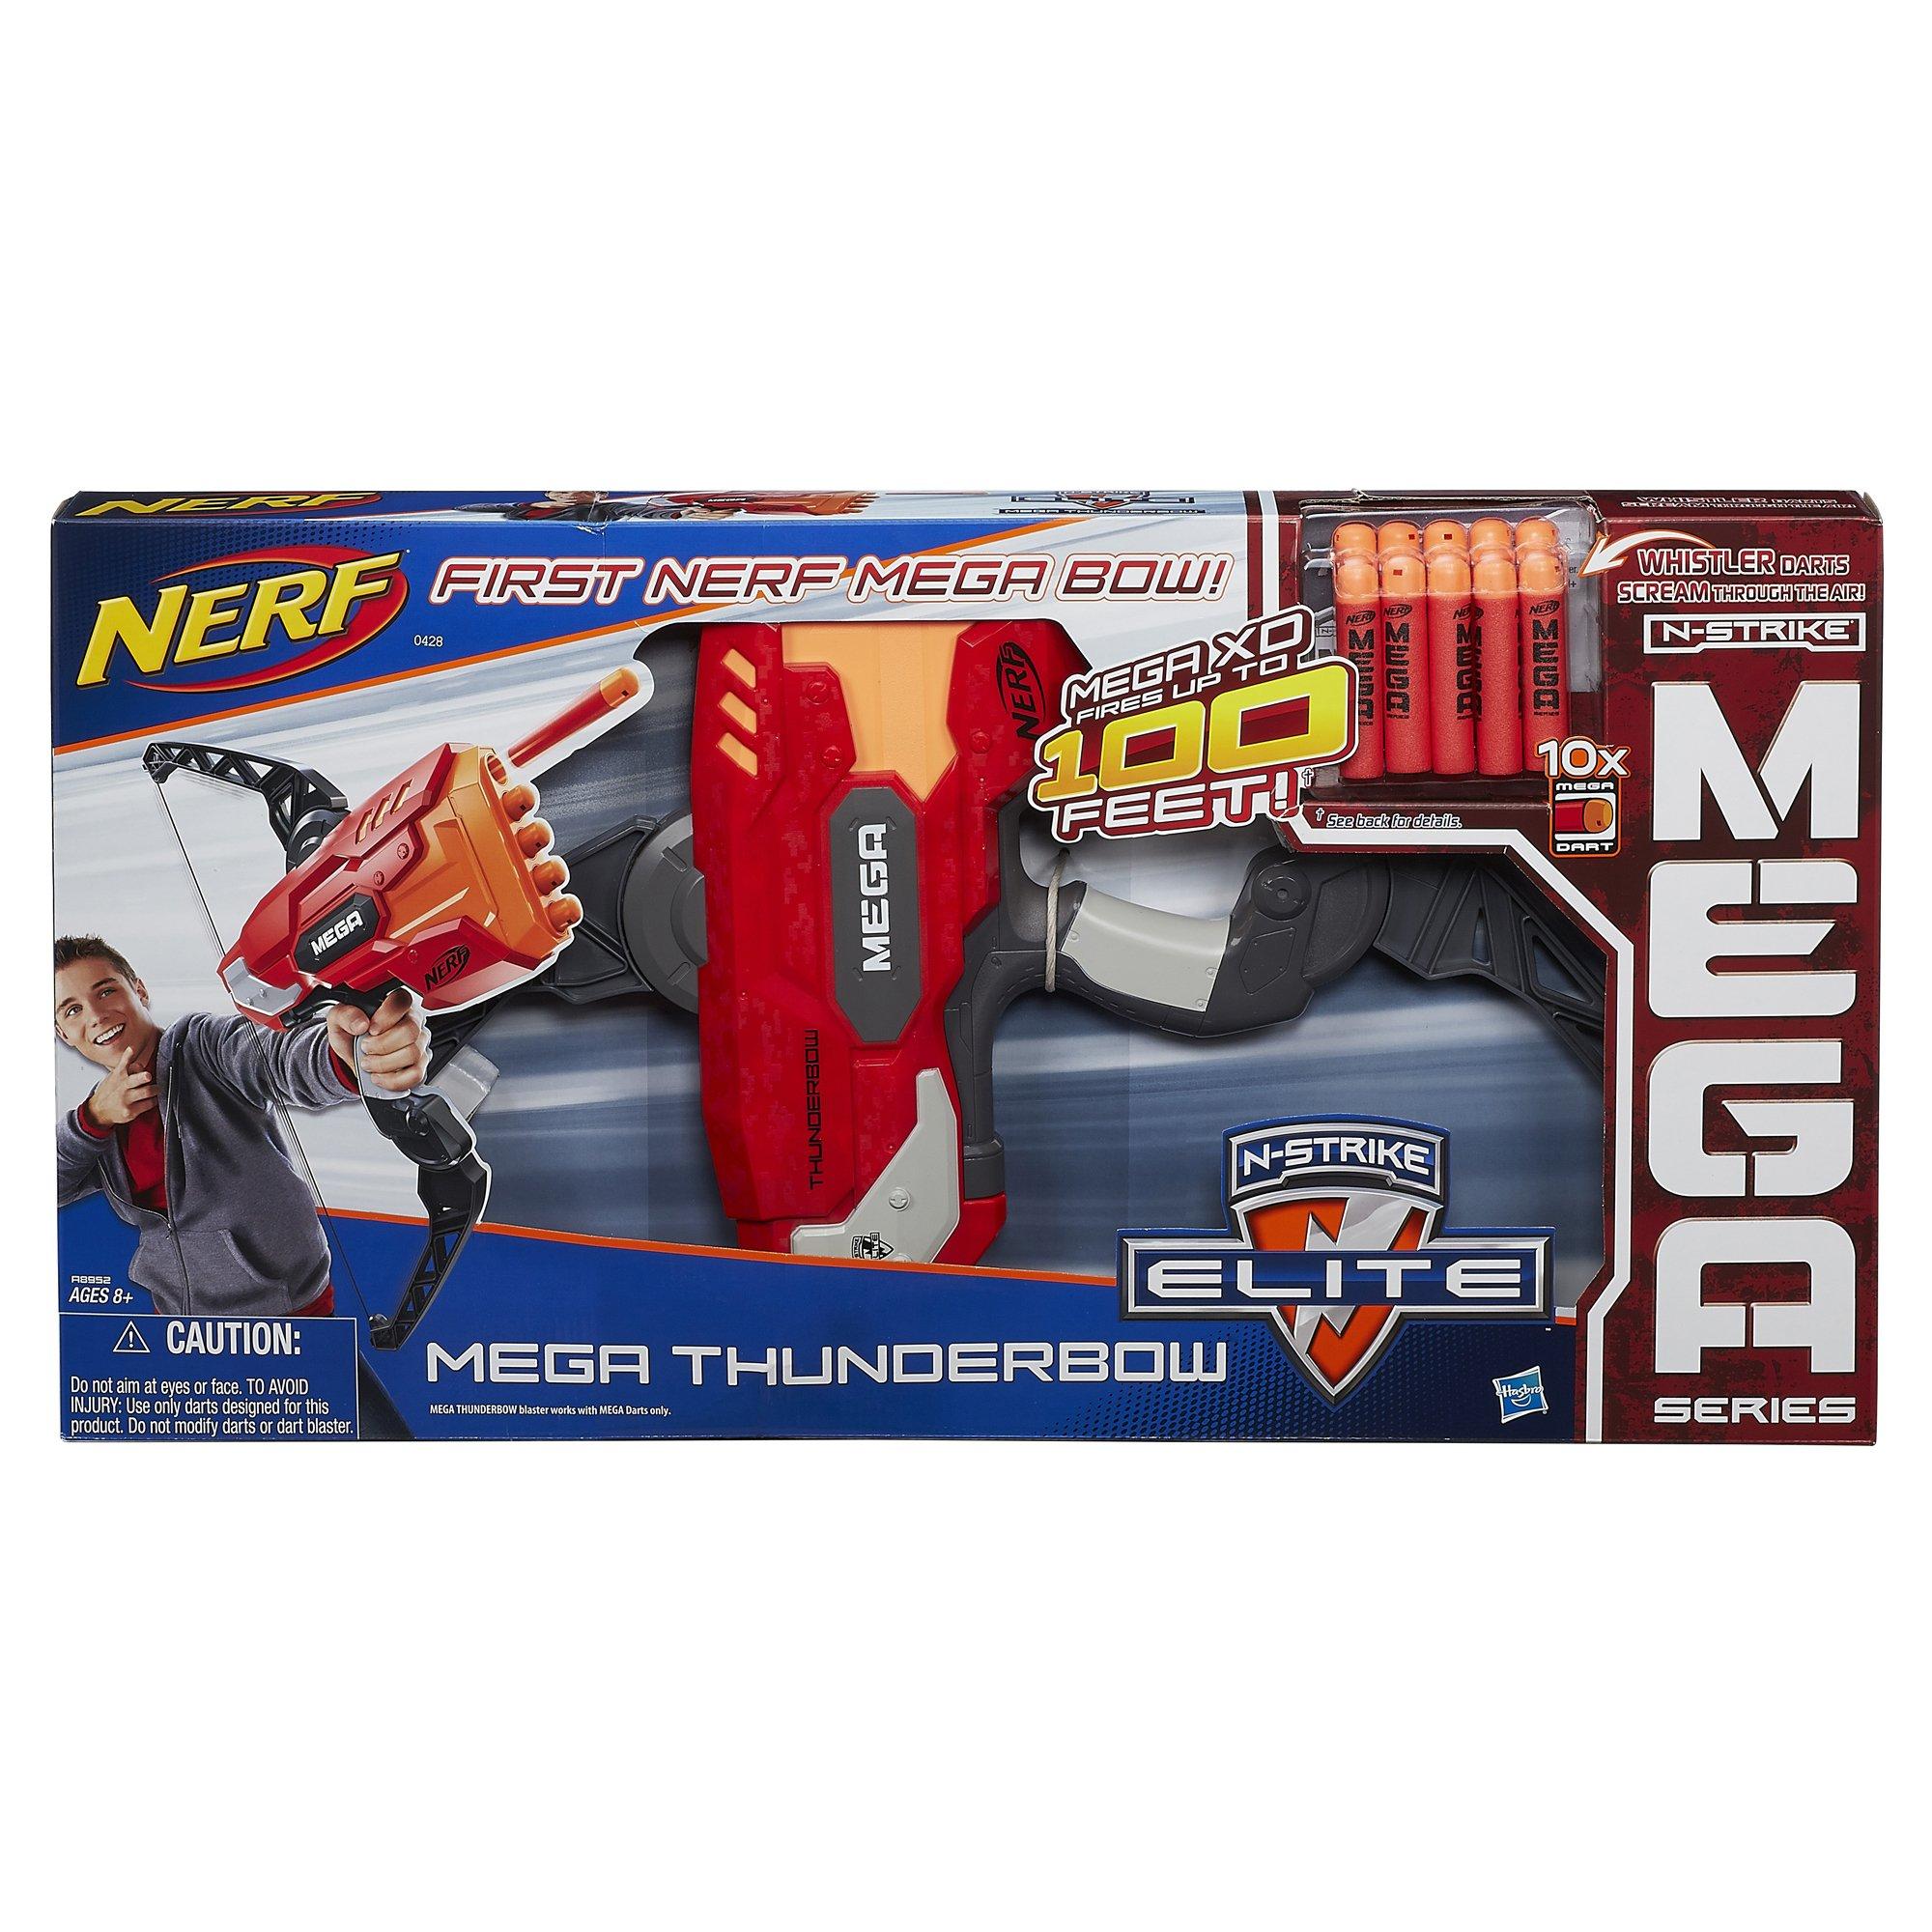 Nerf Mega ThunderBow Blaster by NERF (Image #2)